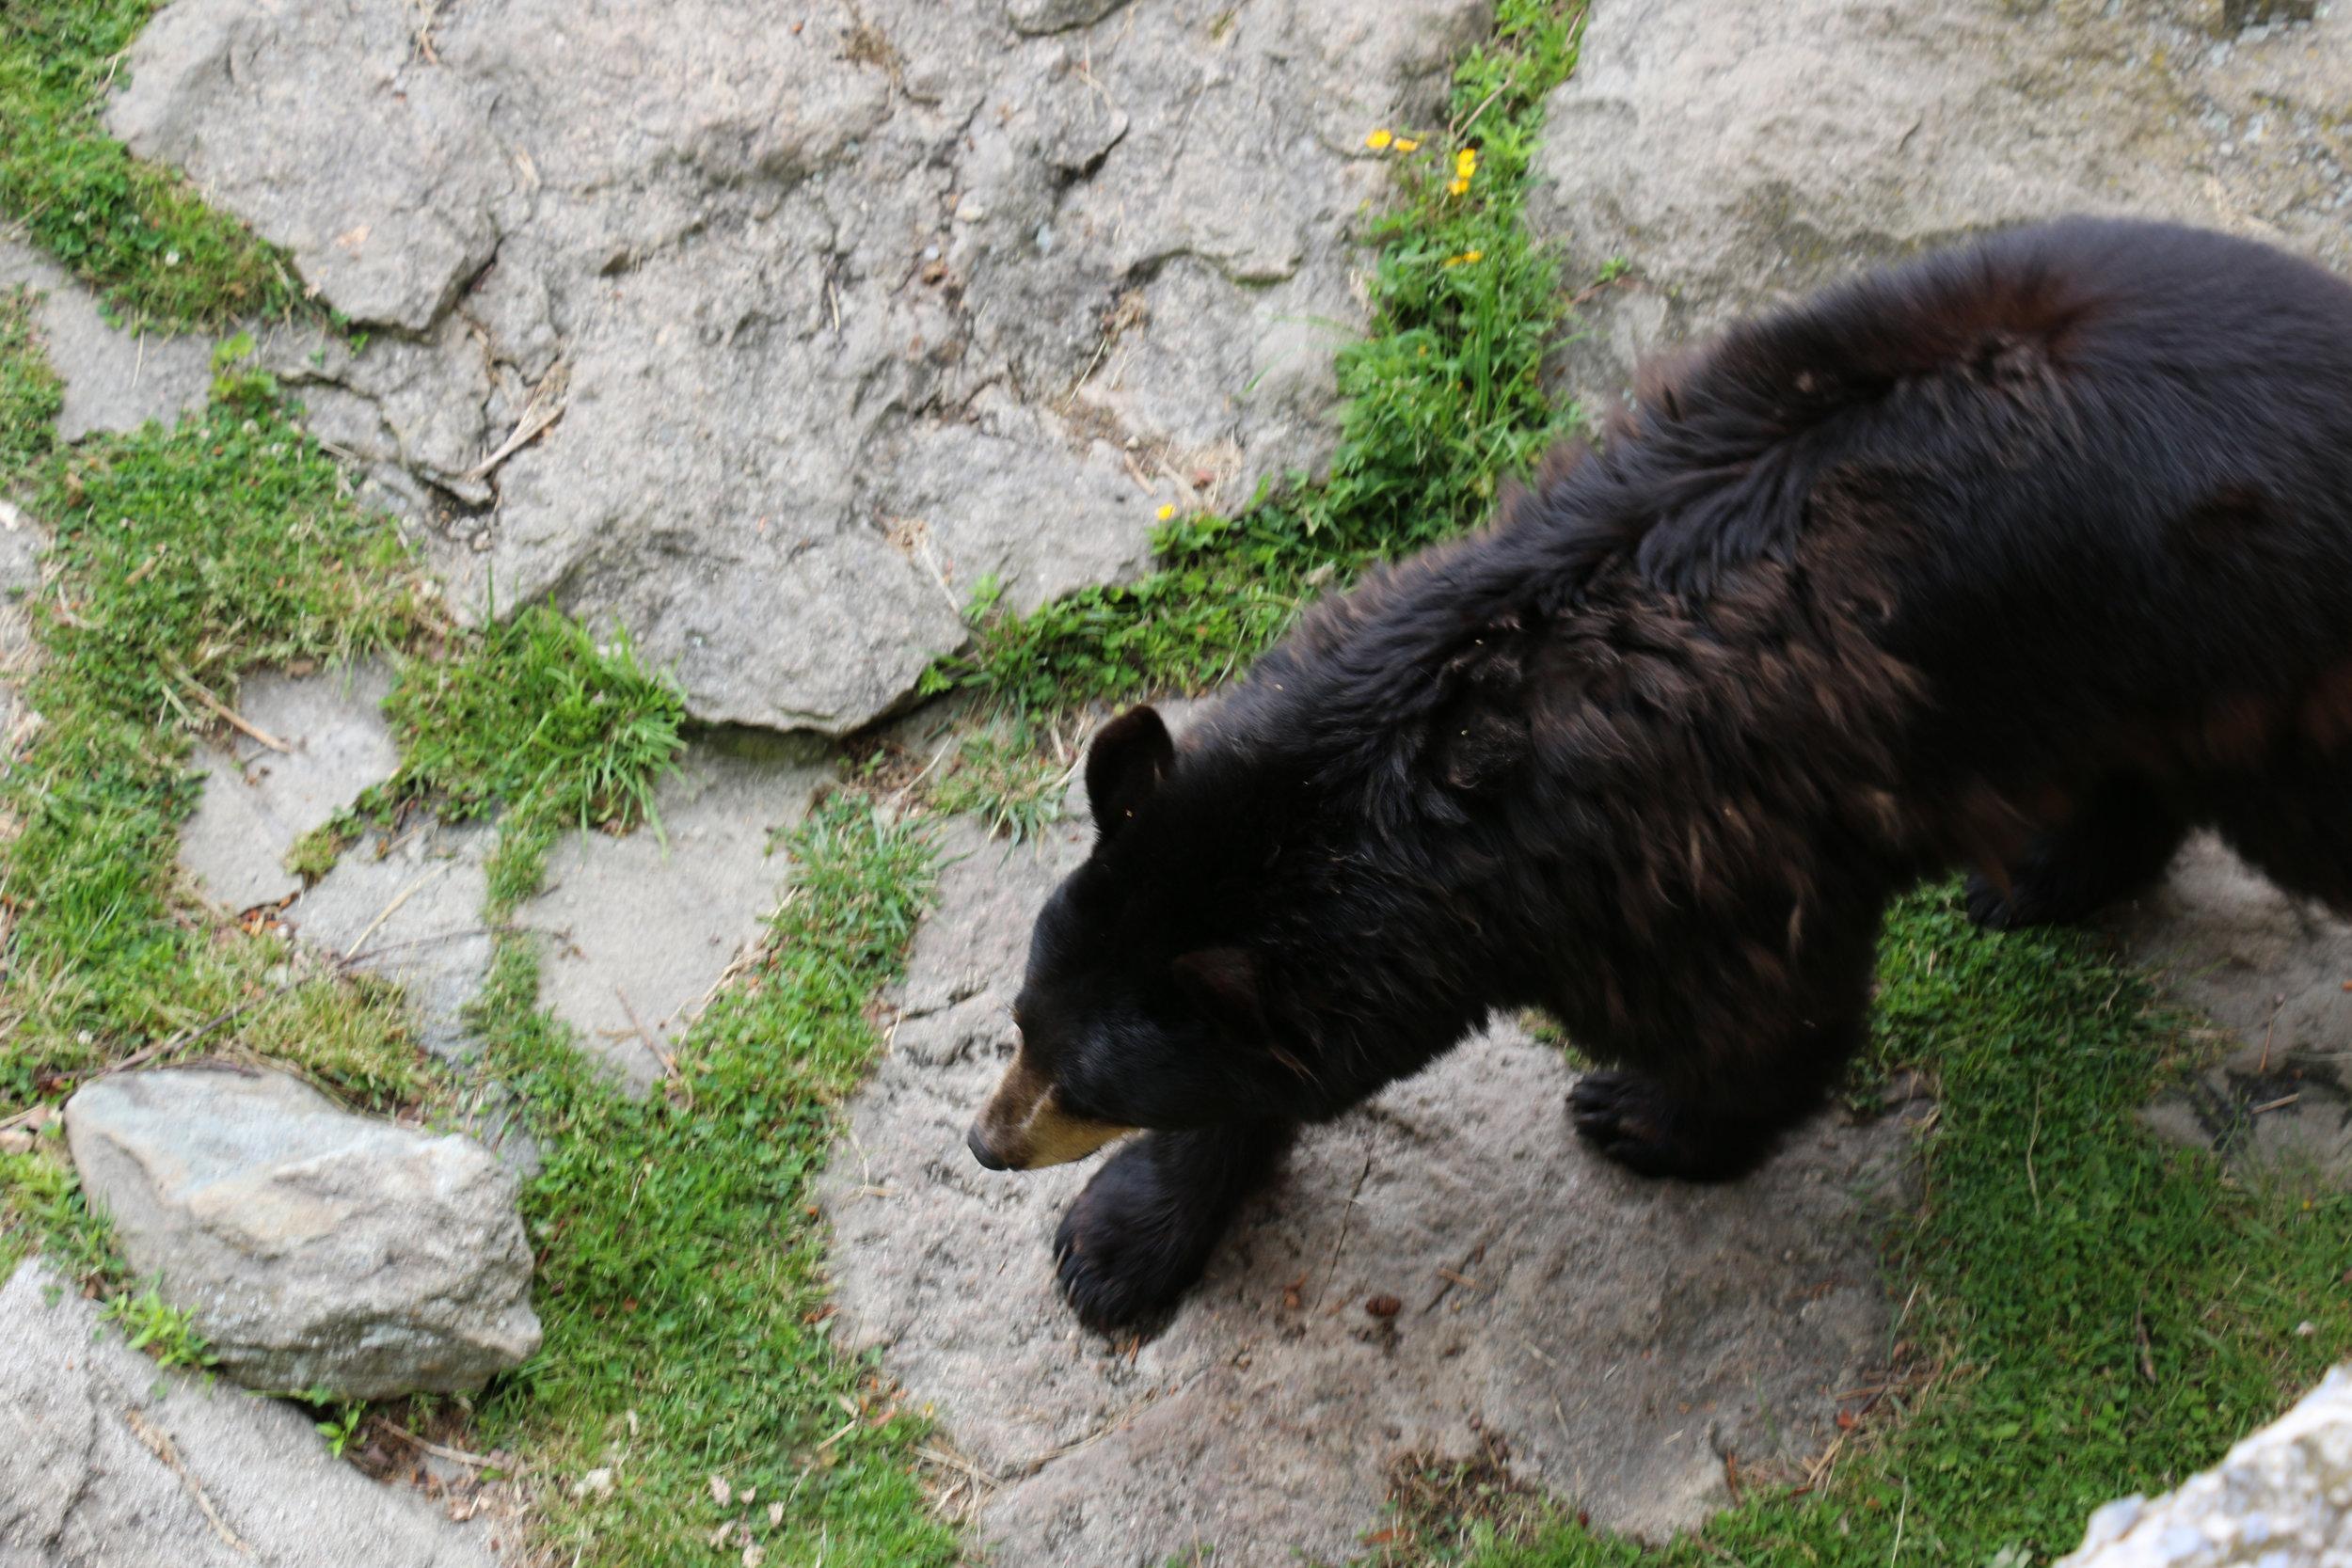 grandfather-mountain-wildlife-habitat-bear